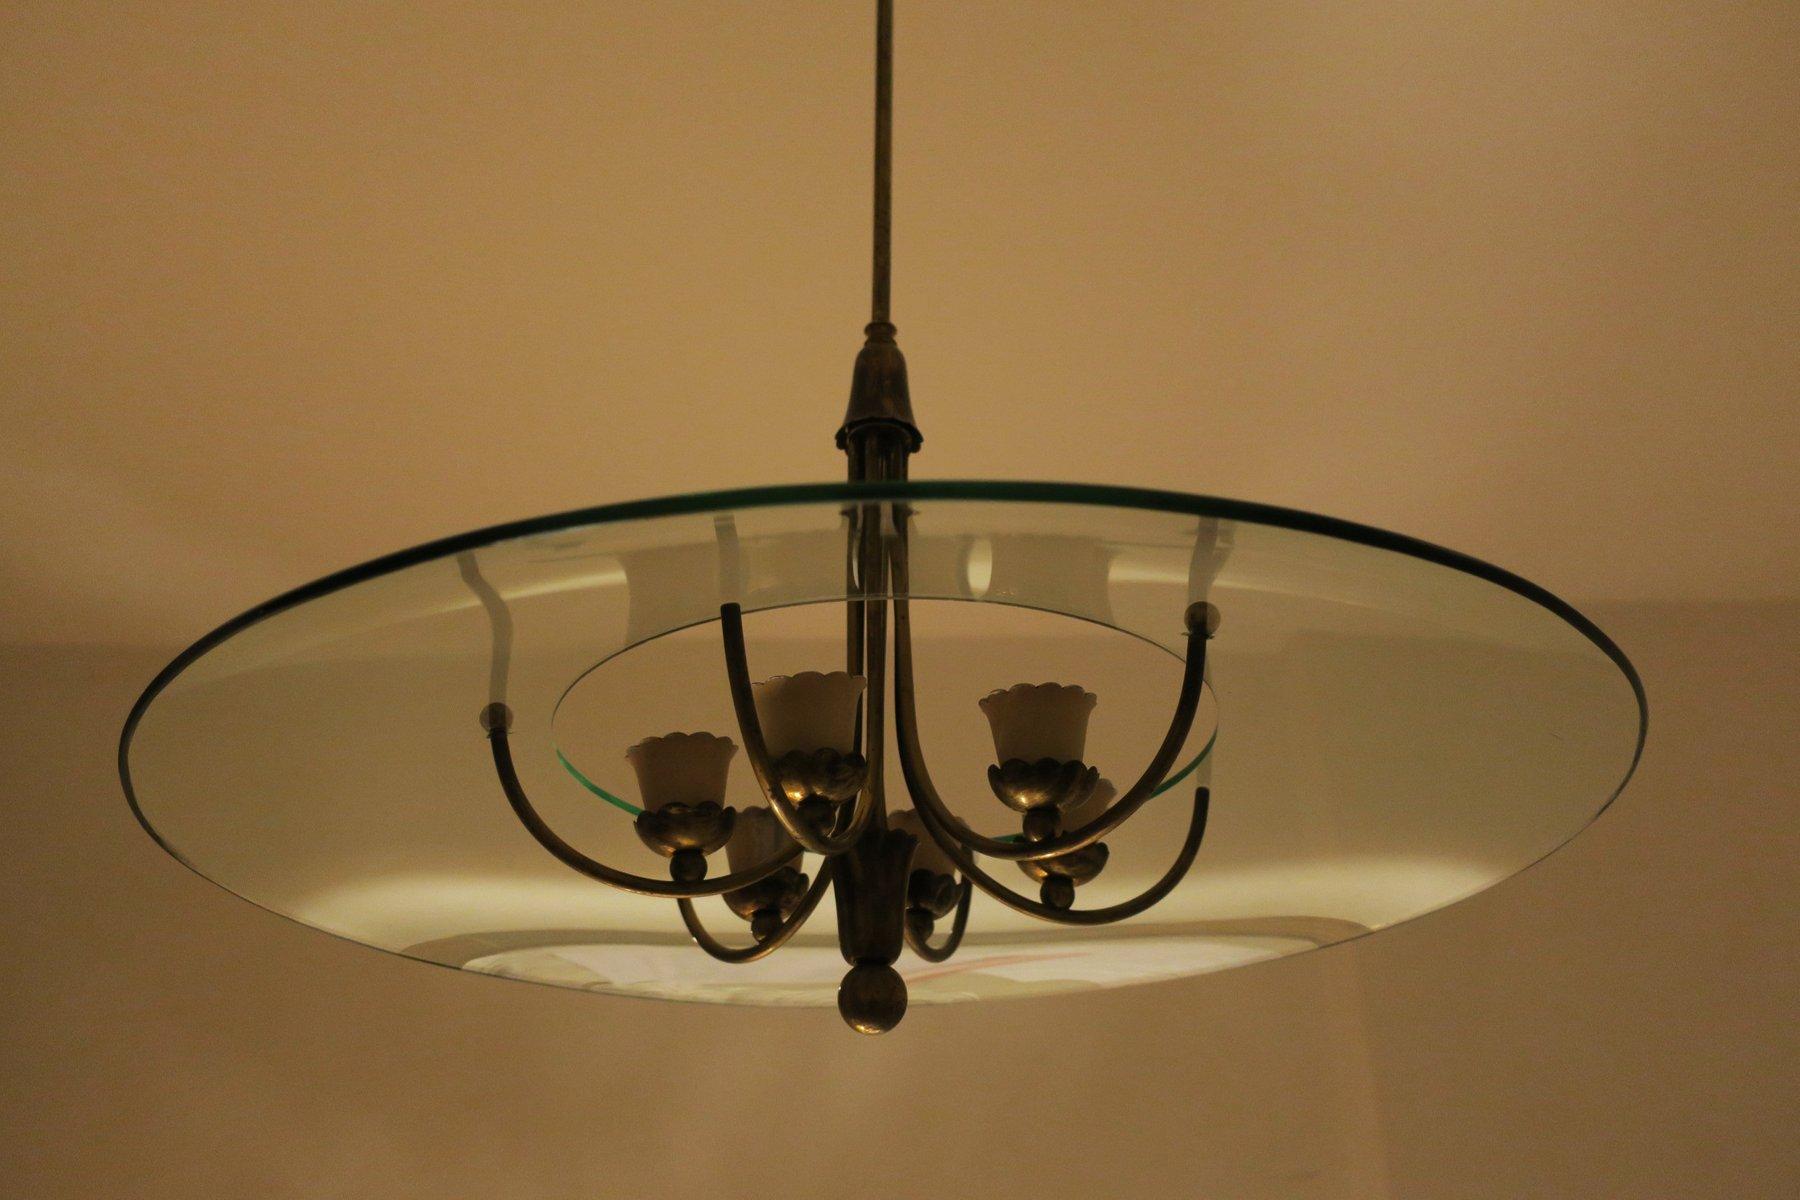 chandelier vintage en laiton verre italie 1950s en vente sur pamono. Black Bedroom Furniture Sets. Home Design Ideas